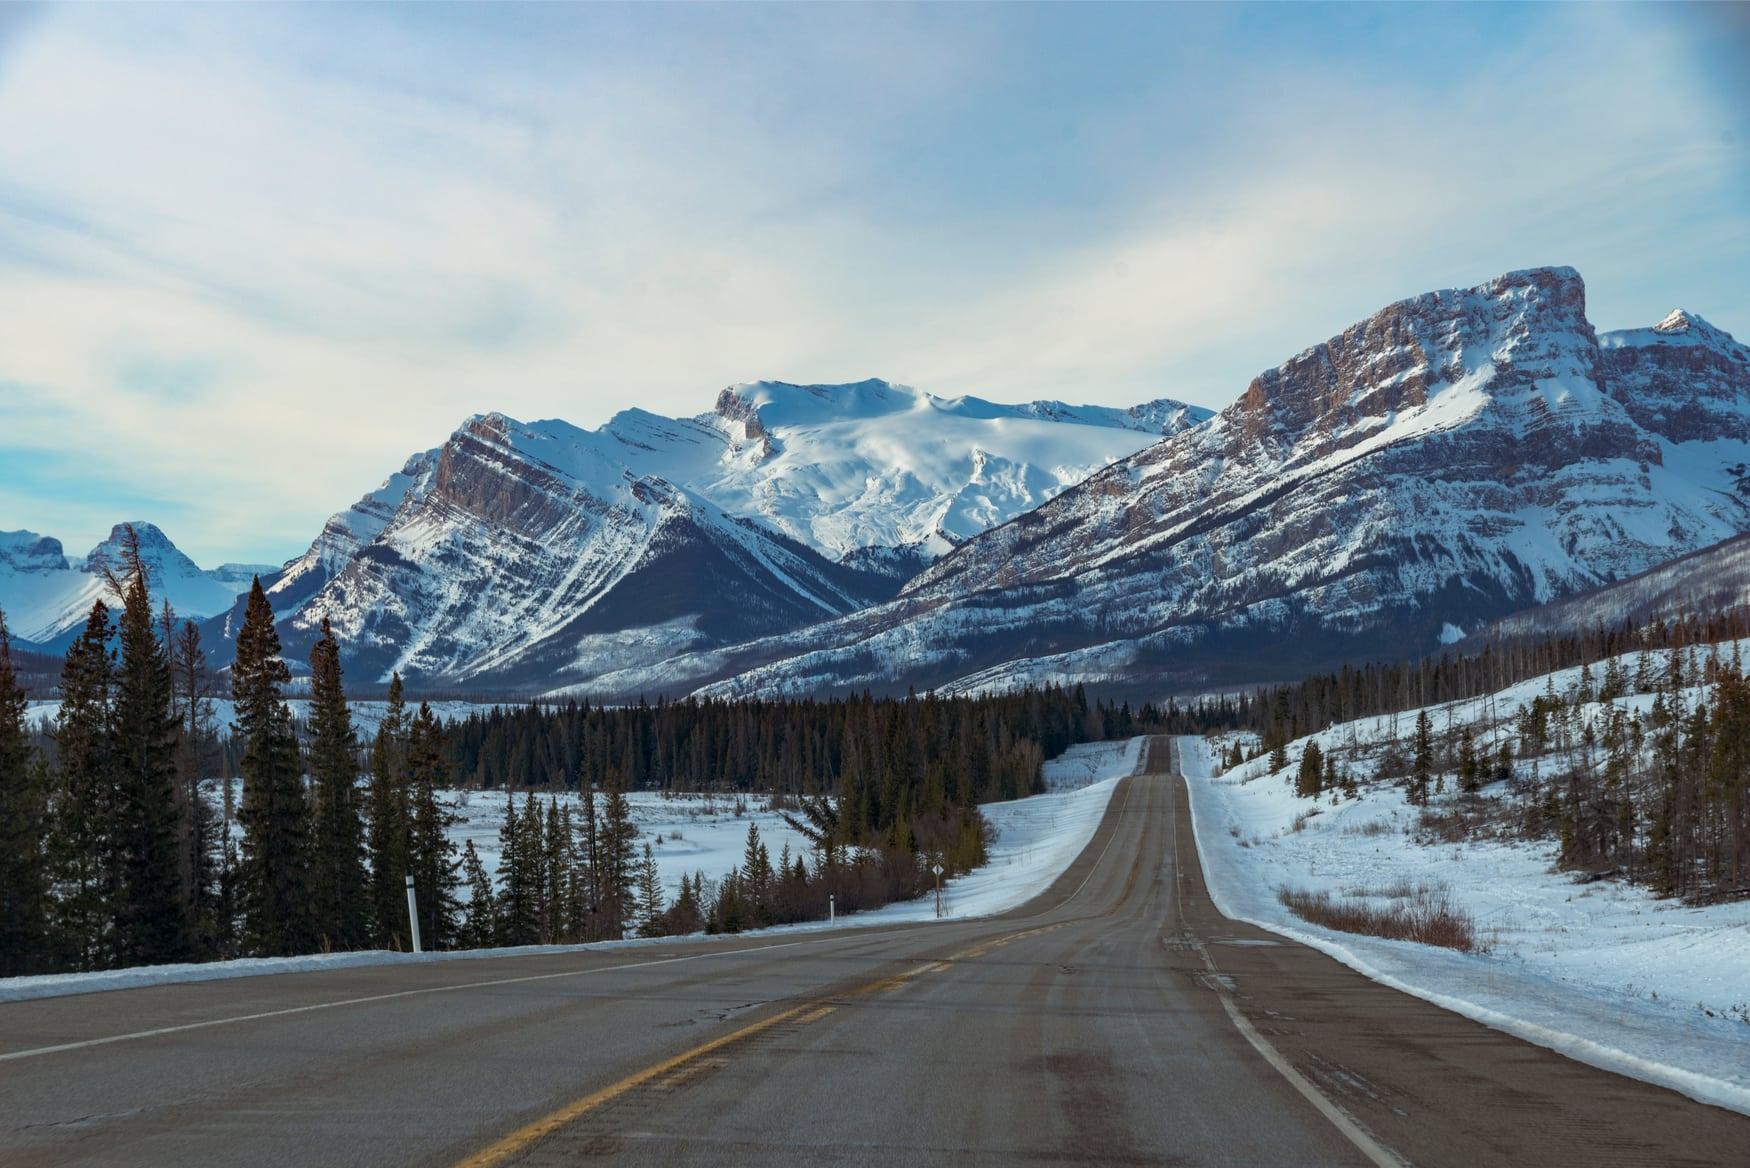 Icefields Parkway Panoramastraße in Alberta